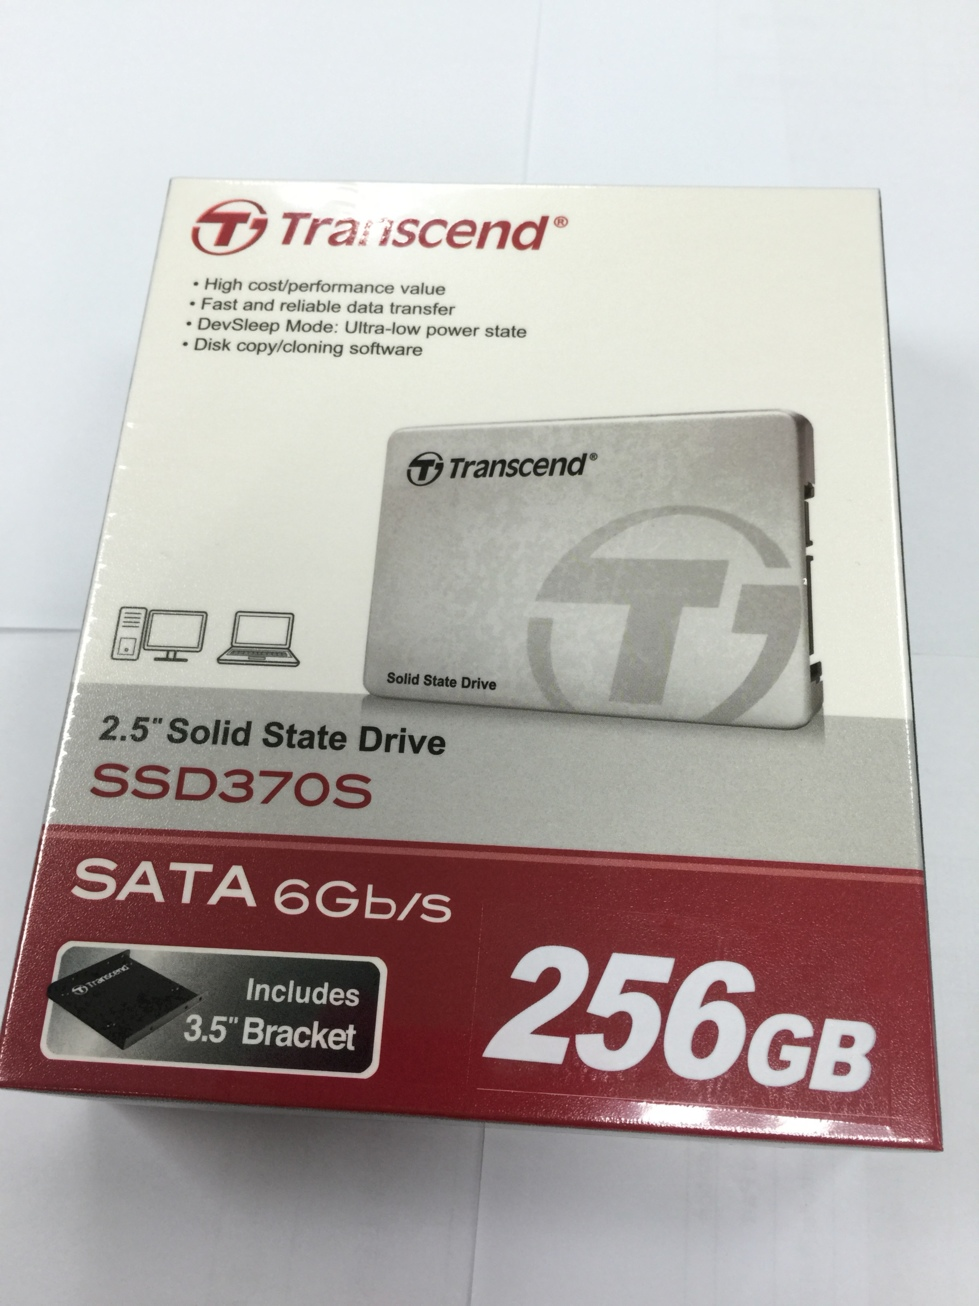 SSD370S